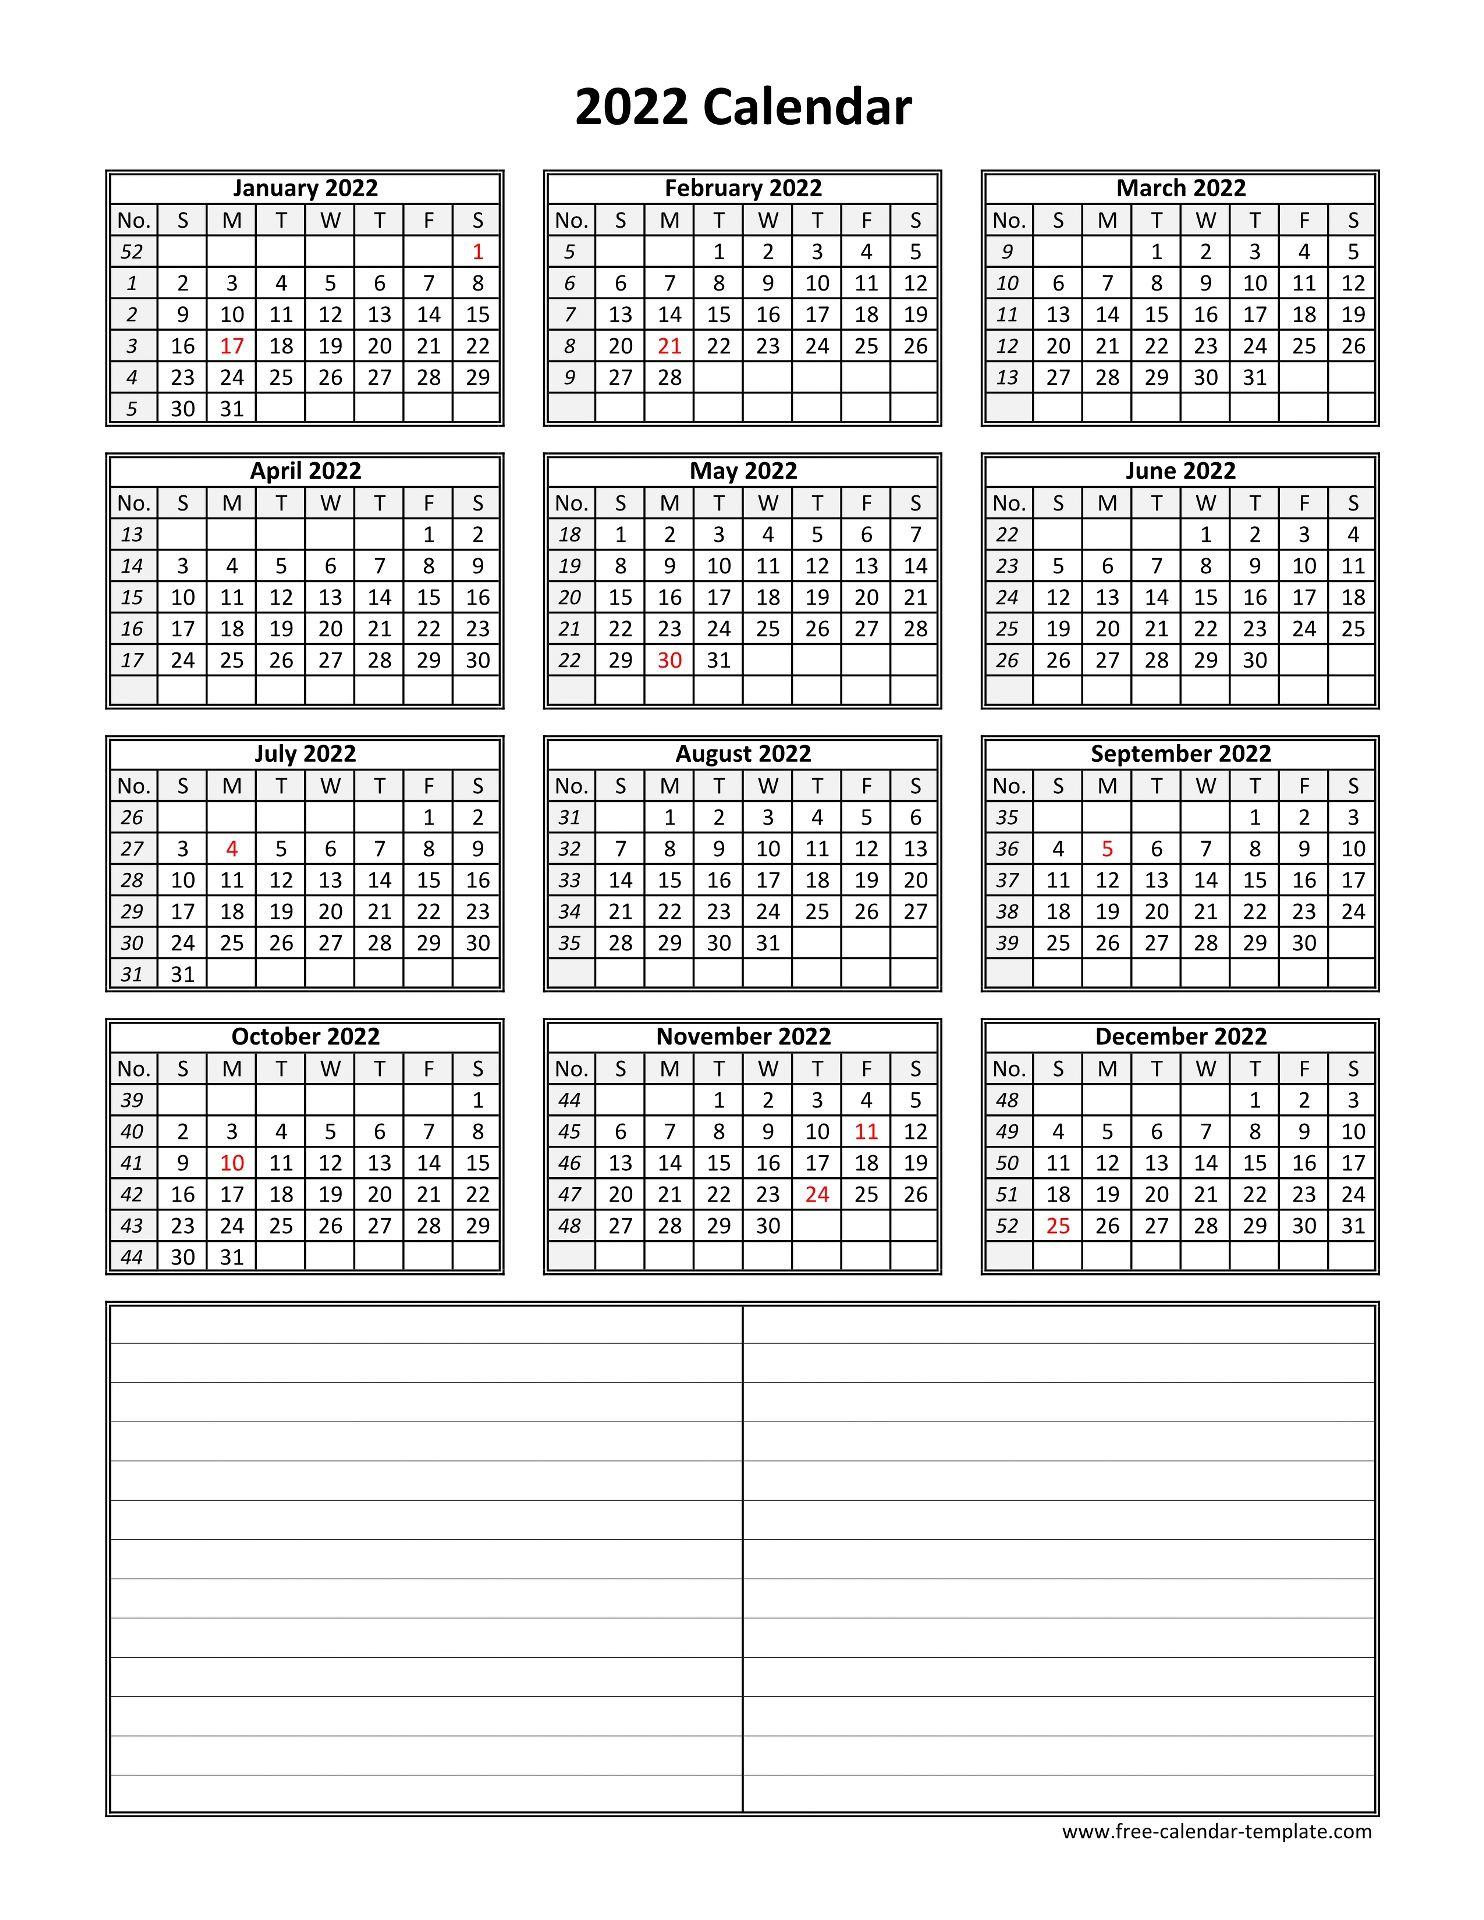 Printable Yearly Calendar 2022 | Free-calendar-template.com